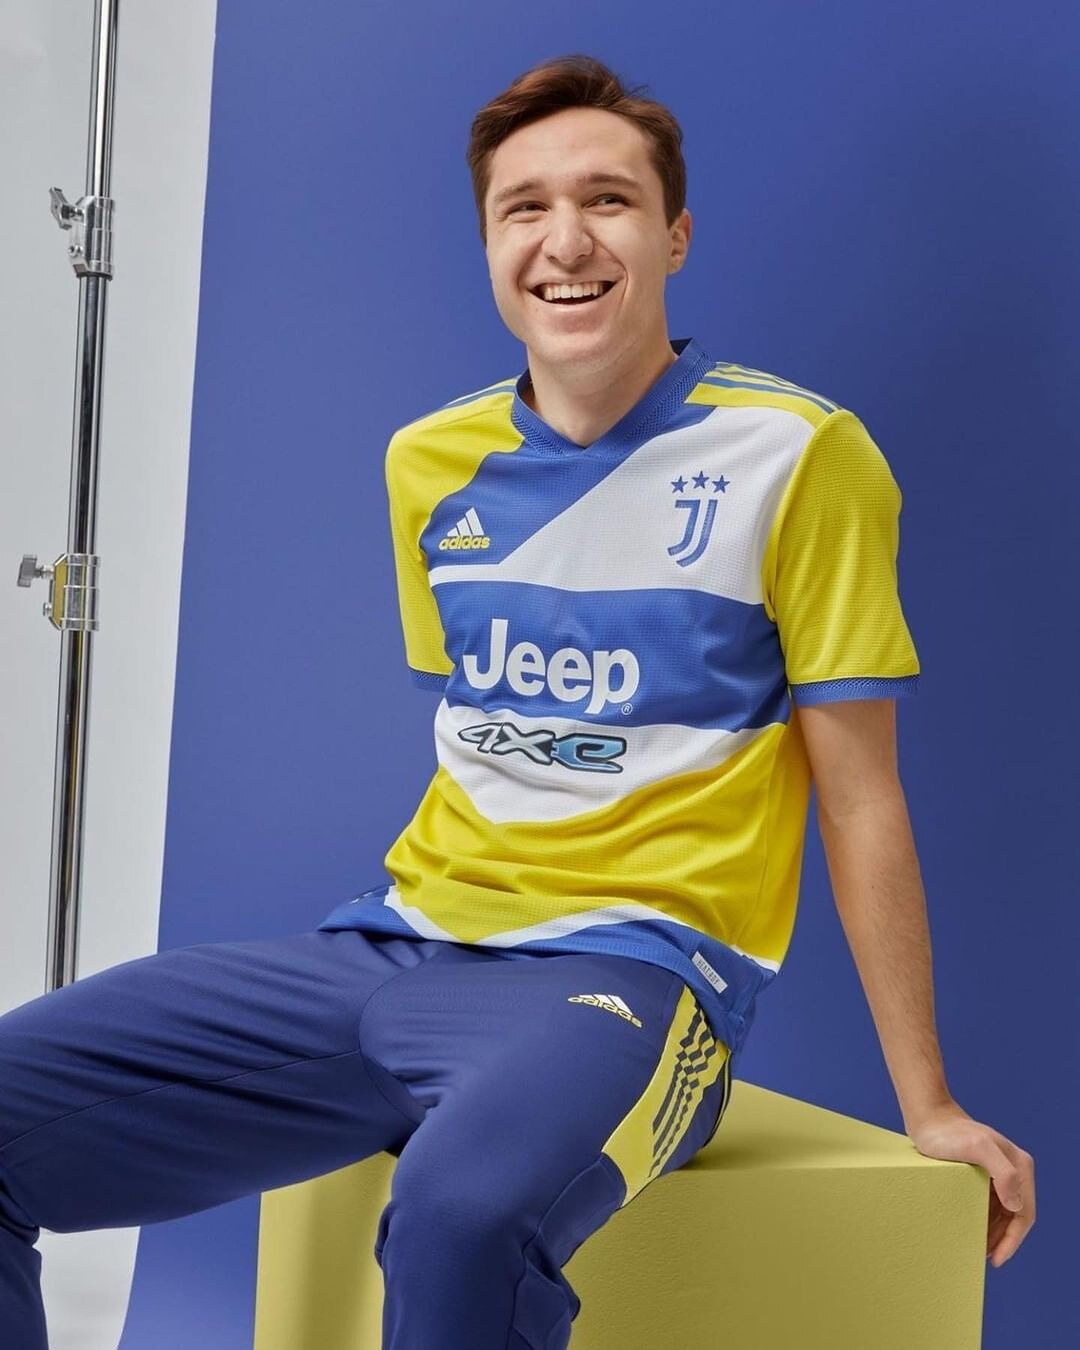 Juventus Terzo Kit Stagione 2021-22